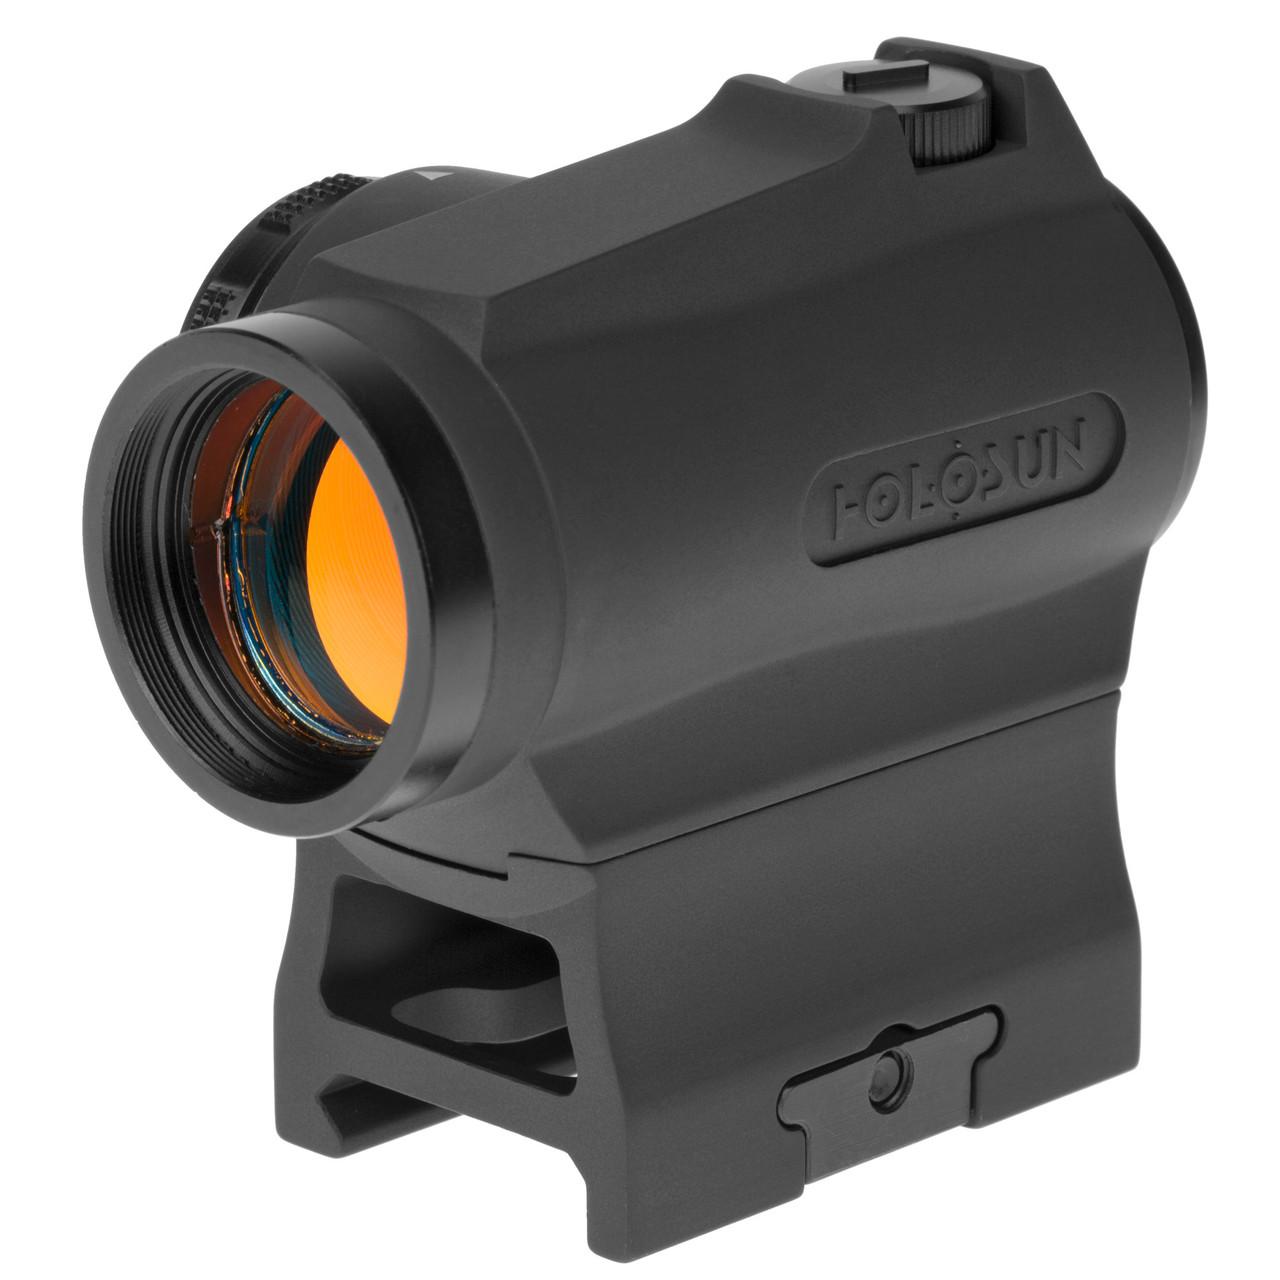 Holosun 403R Micro Red Dot